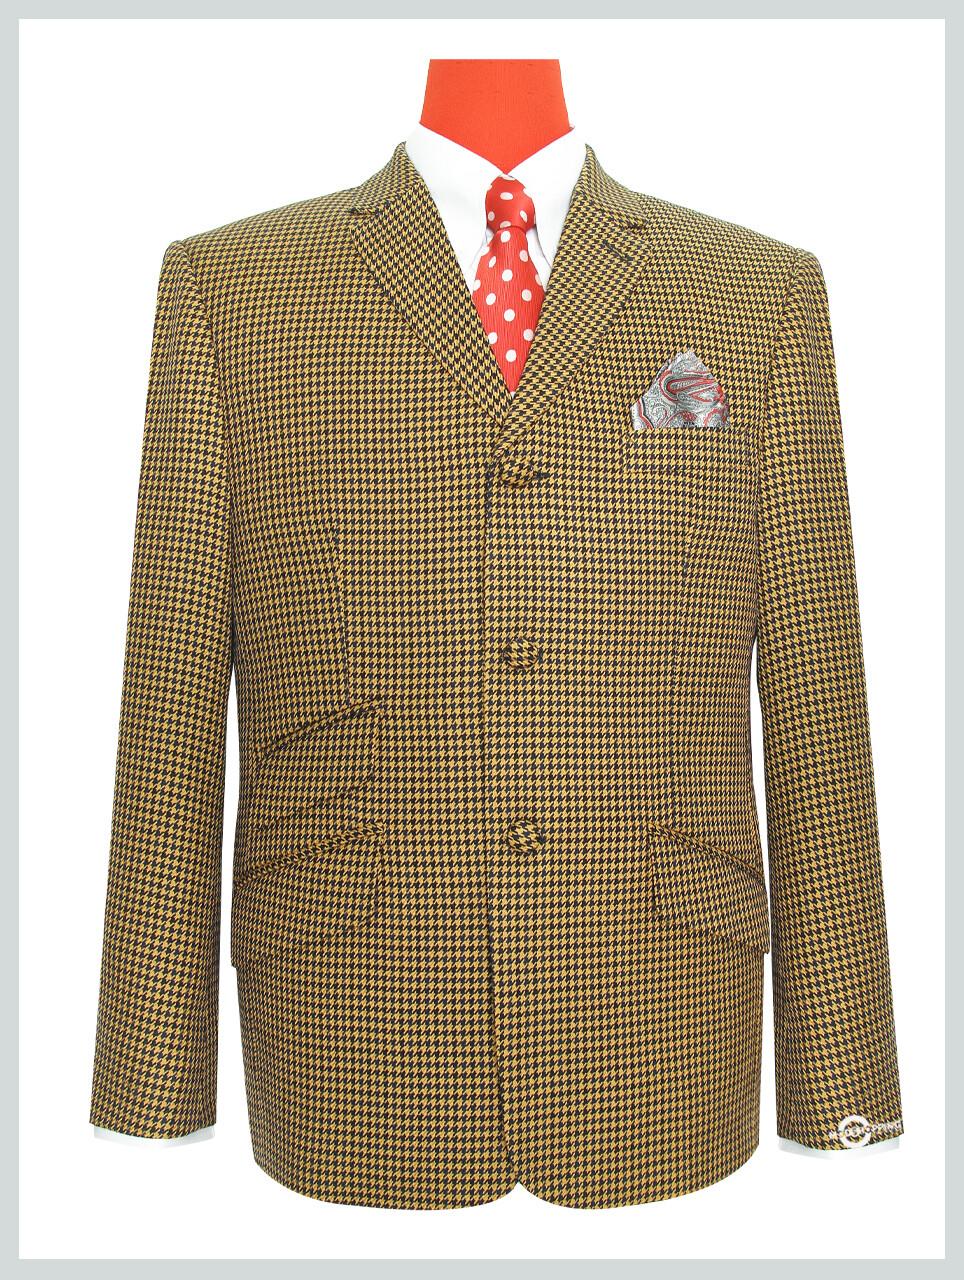 Retro Blazer Brown Houndstooth Check Vintage 60s Mod Blazer Jacket